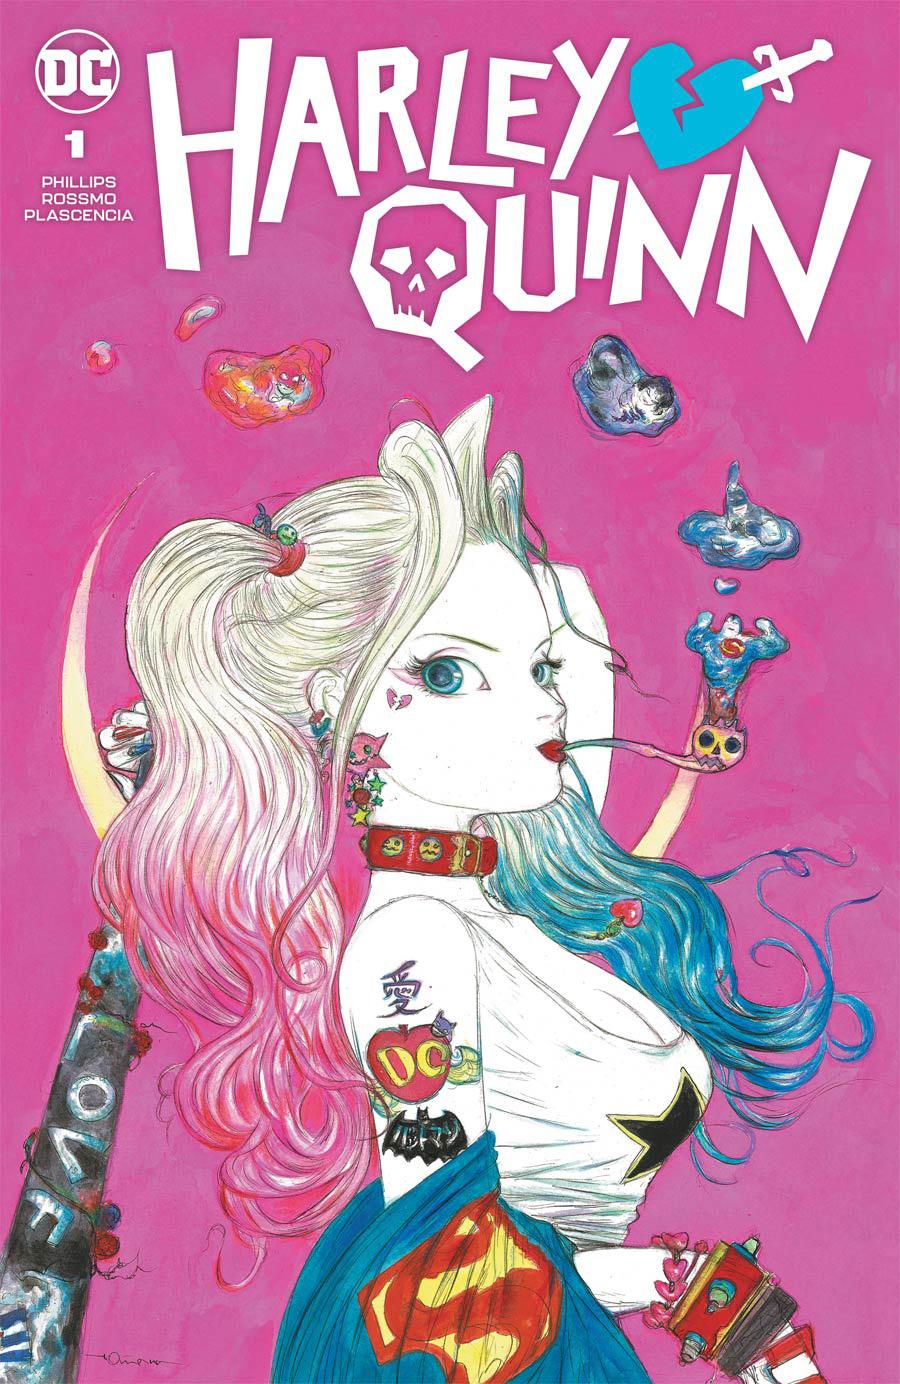 Harley Quinn Vol 4 #1 Cover D Variant Yoshitaka Amano Team Cover